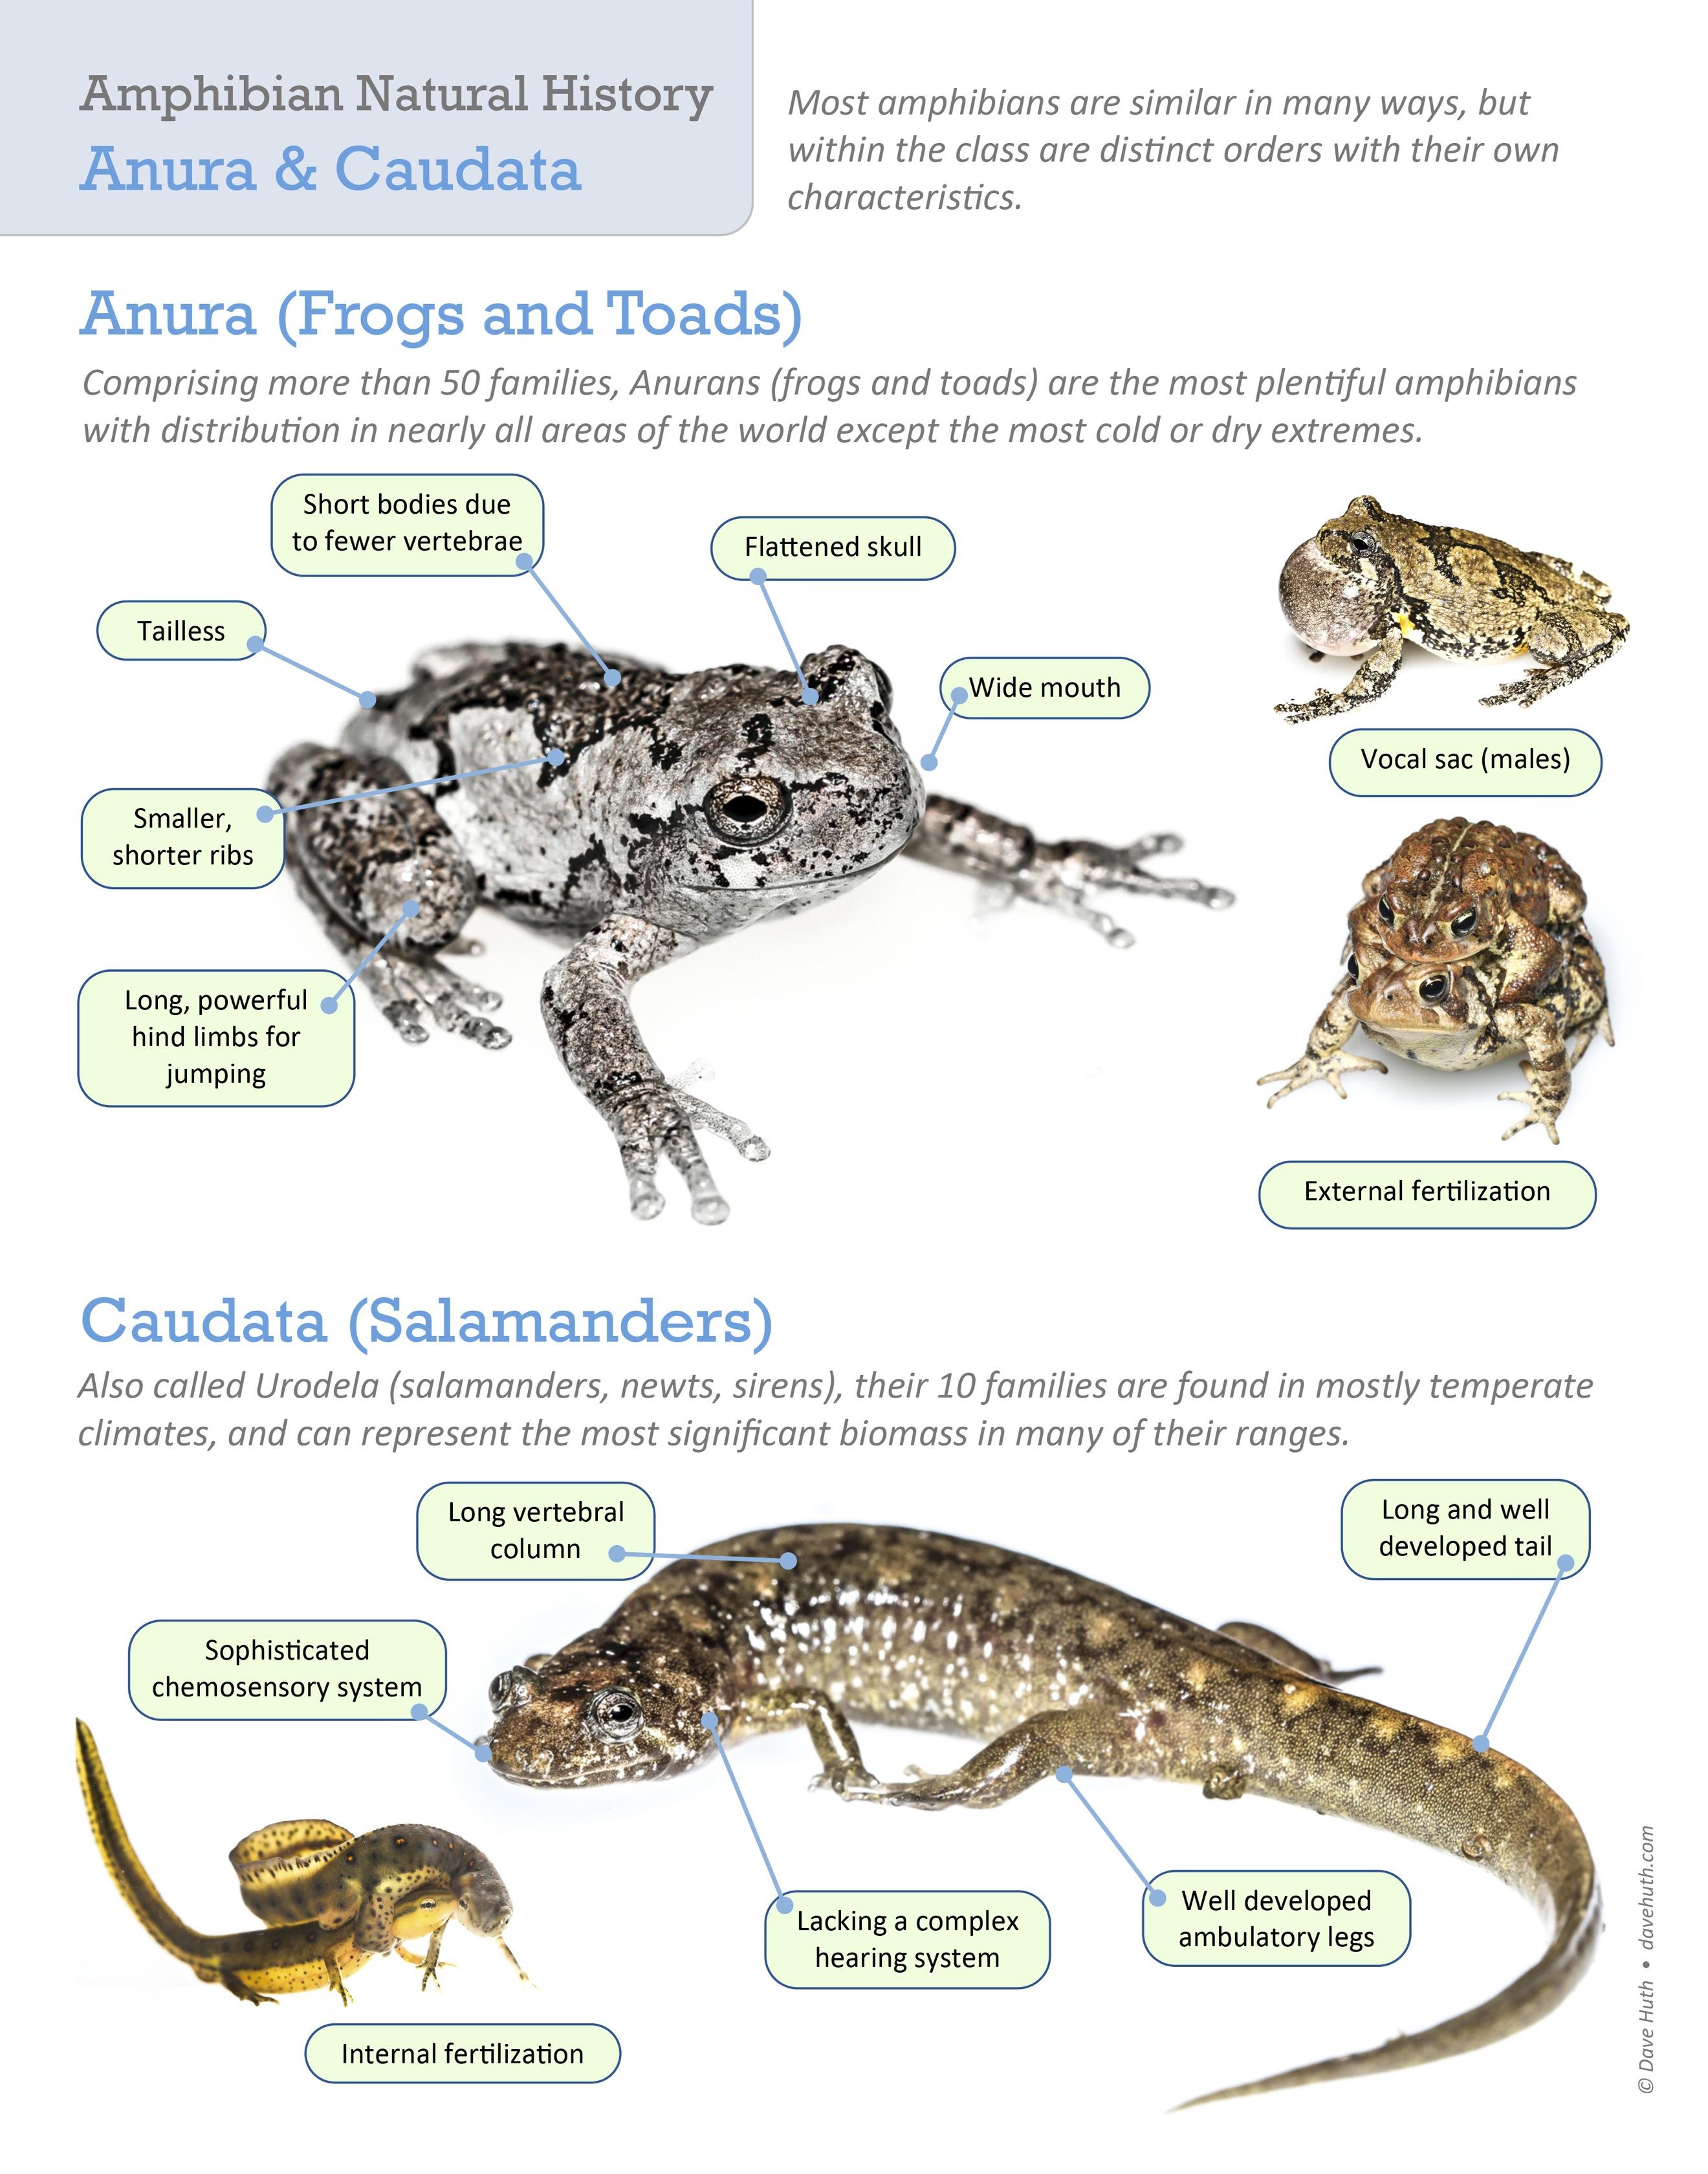 RTPI frogs salamanders 11x14 copy 3.jpg